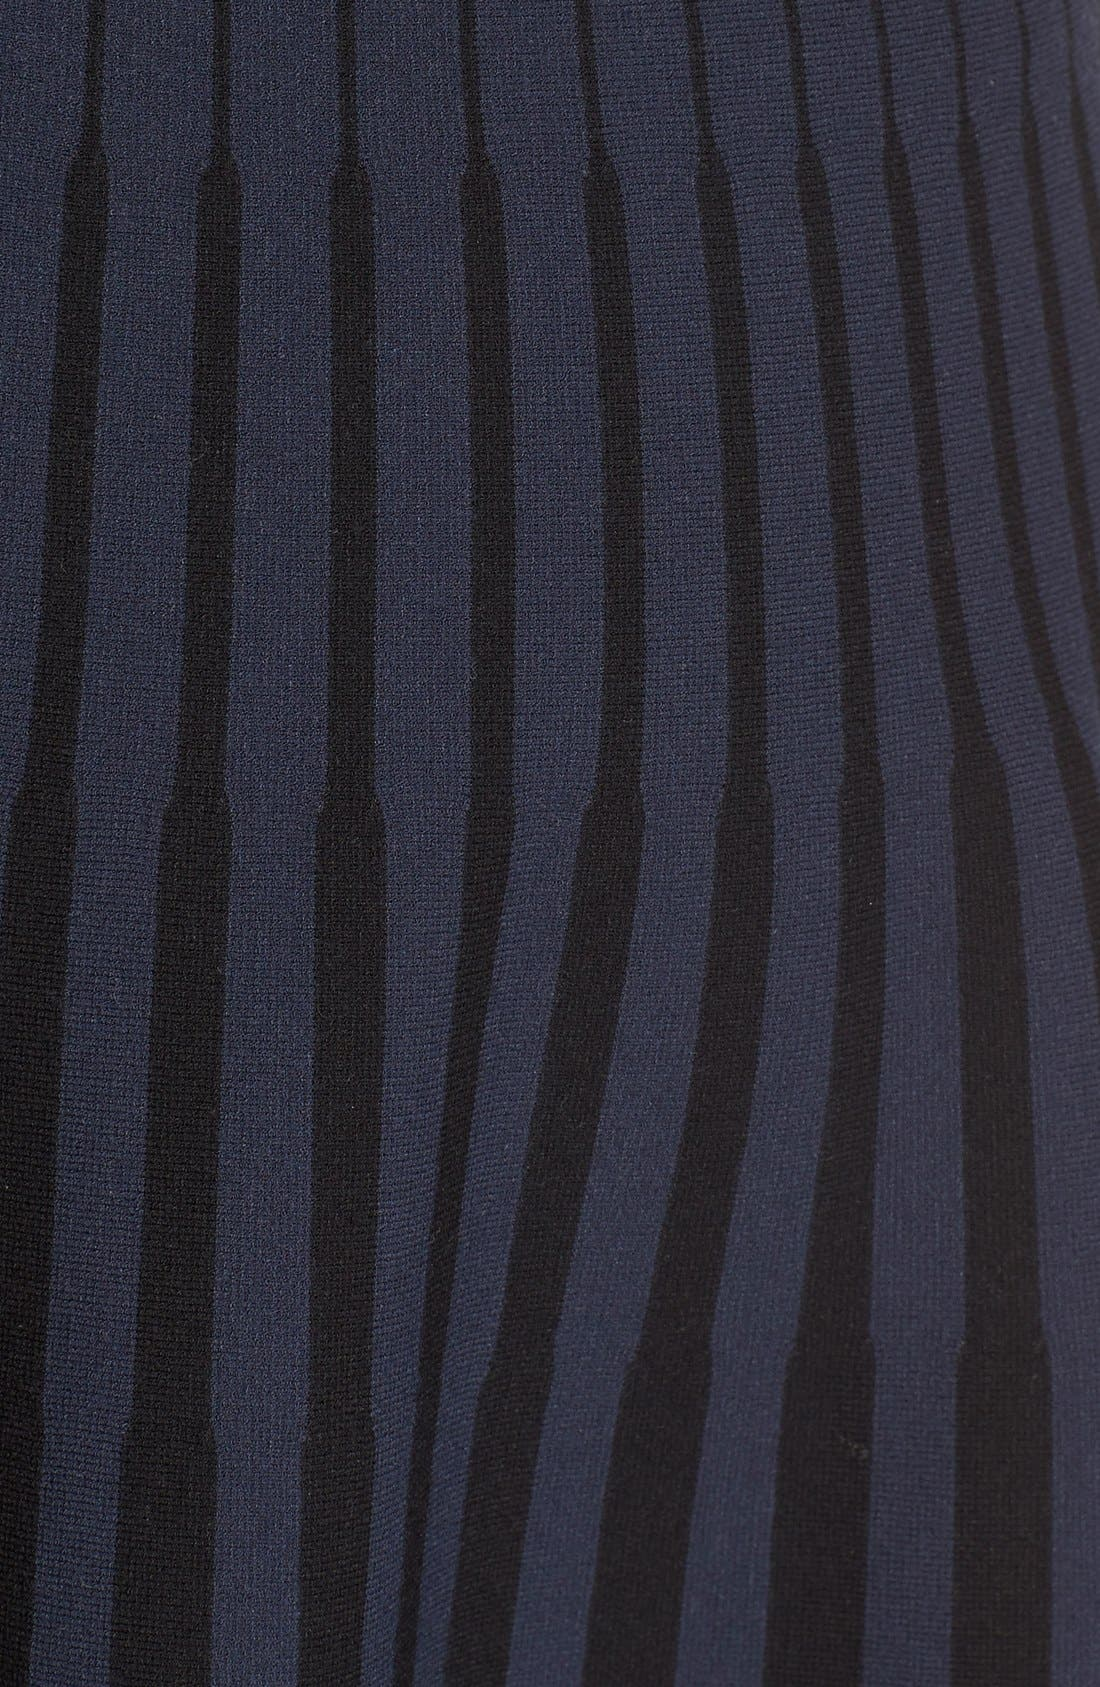 Alternate Image 3  - Tomas Maier Stripe Knit Flared Skirt